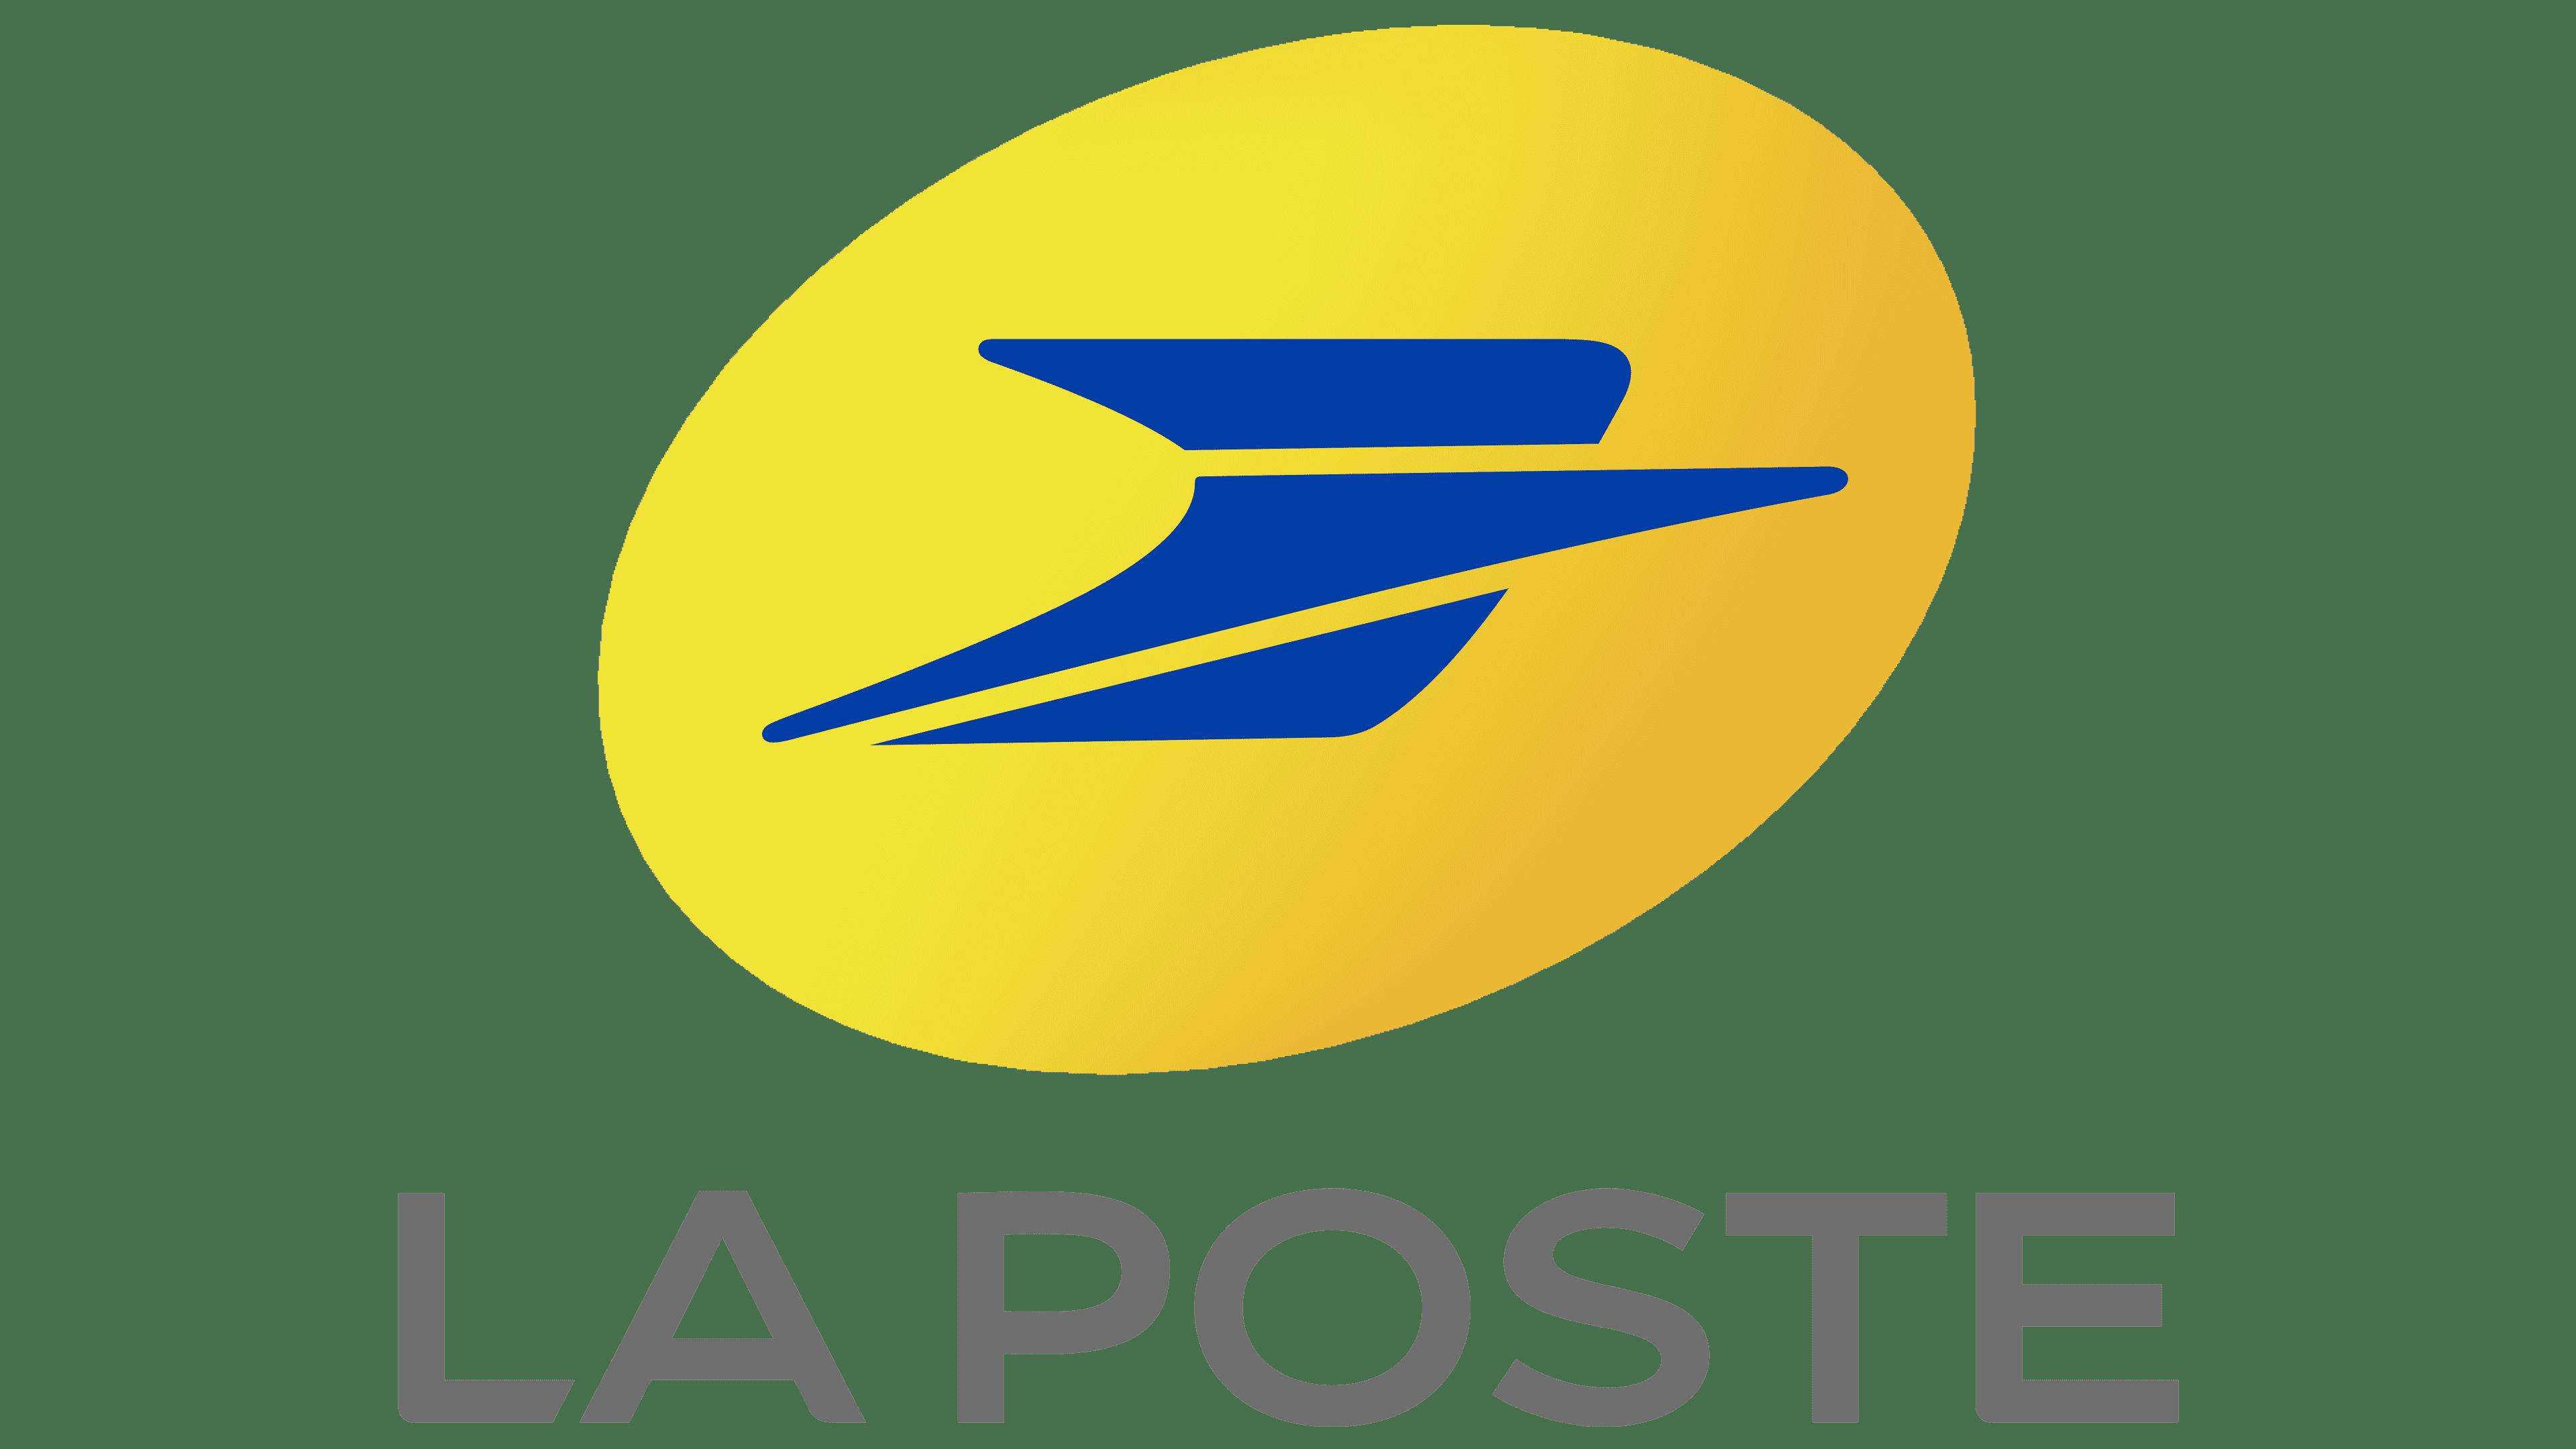 la poste logo (1)